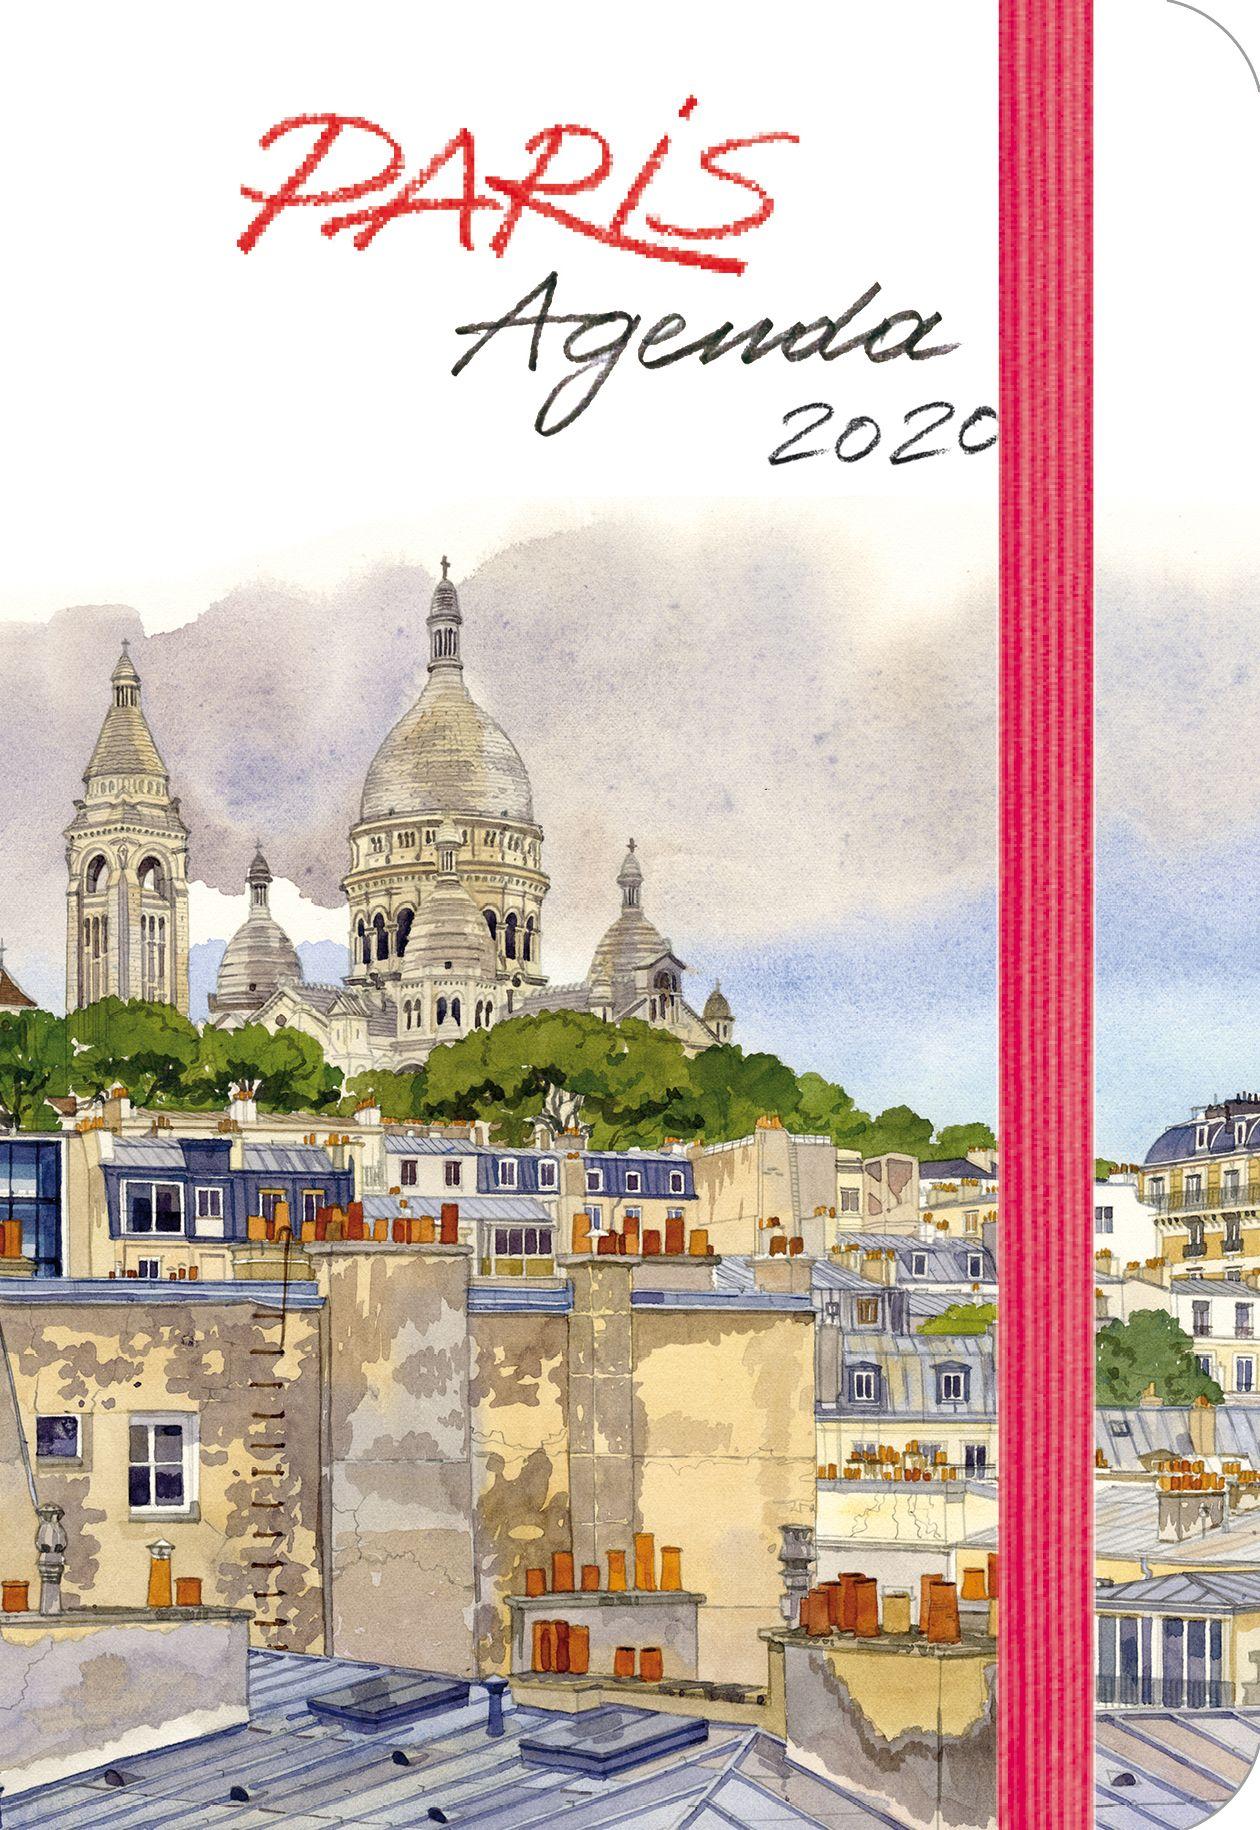 Paris Agenda 2020 Livre Electronique Livre Livre Ebook